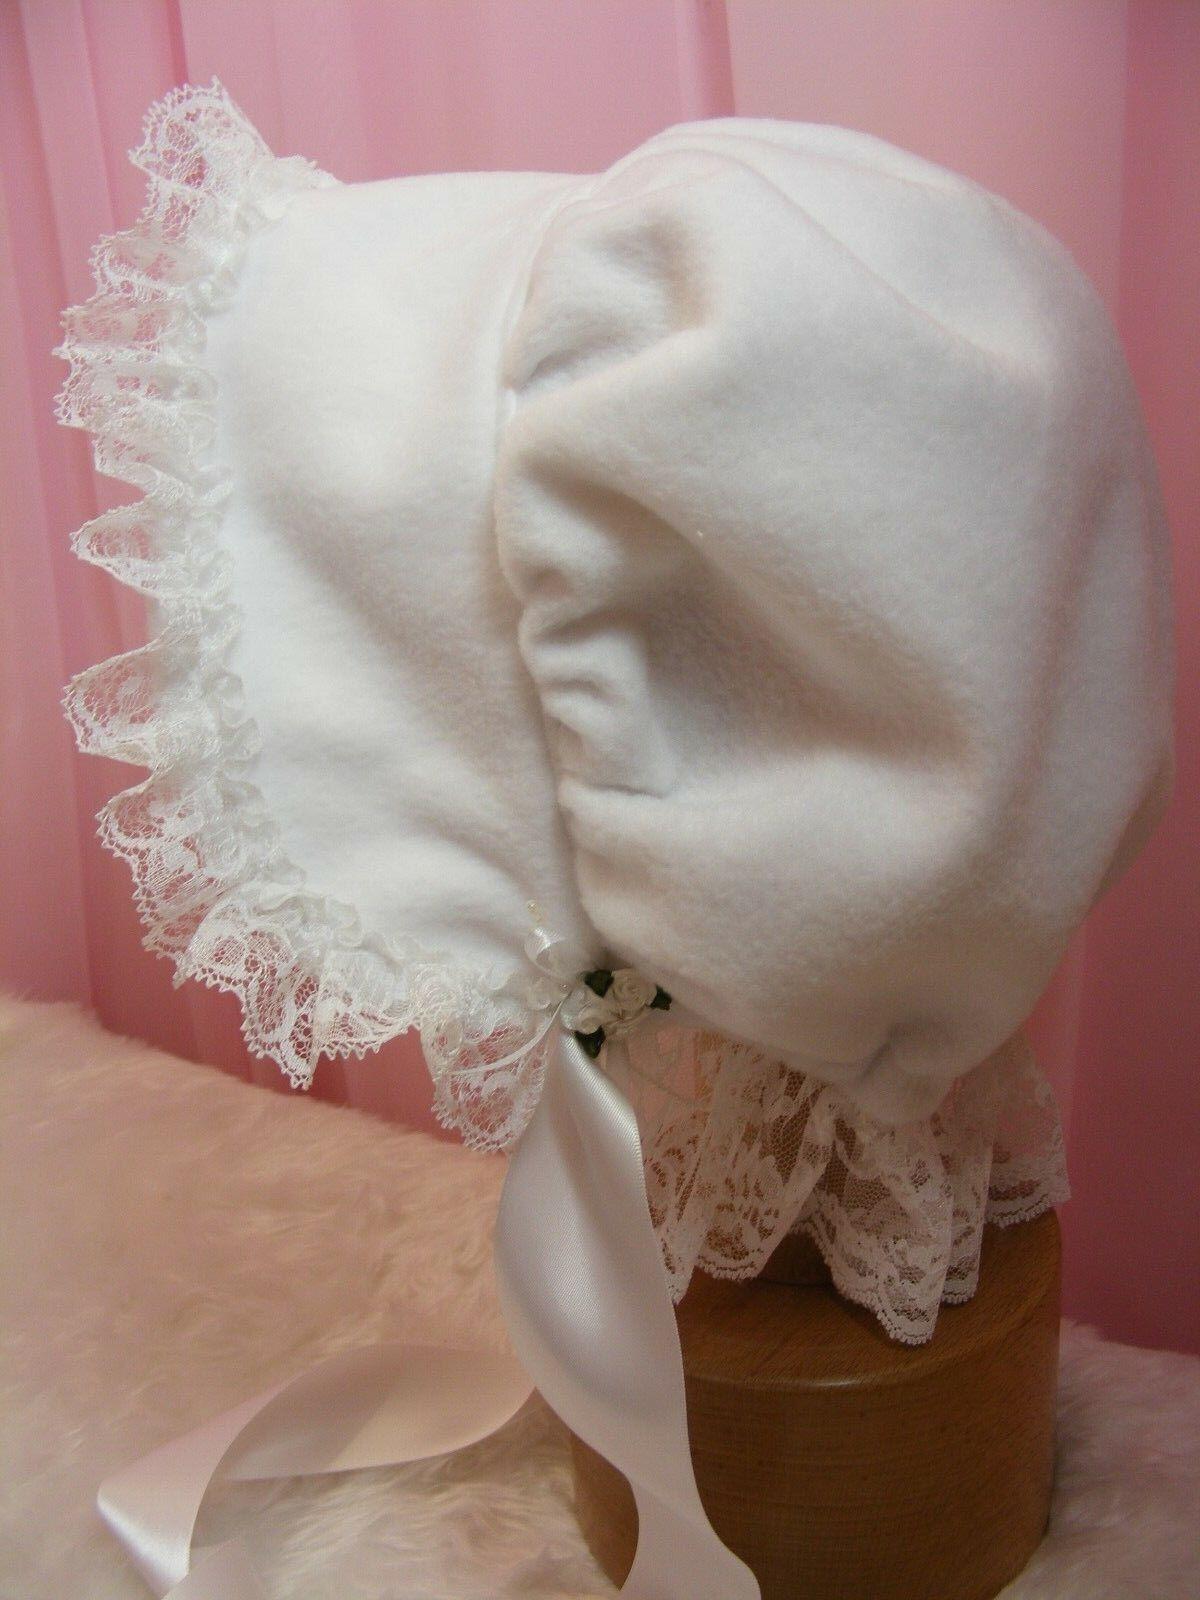 ADULT BABY SISSY BONNET soft white fleece COSPLAY LOLITA FANCY DRESS ROLEPLAY